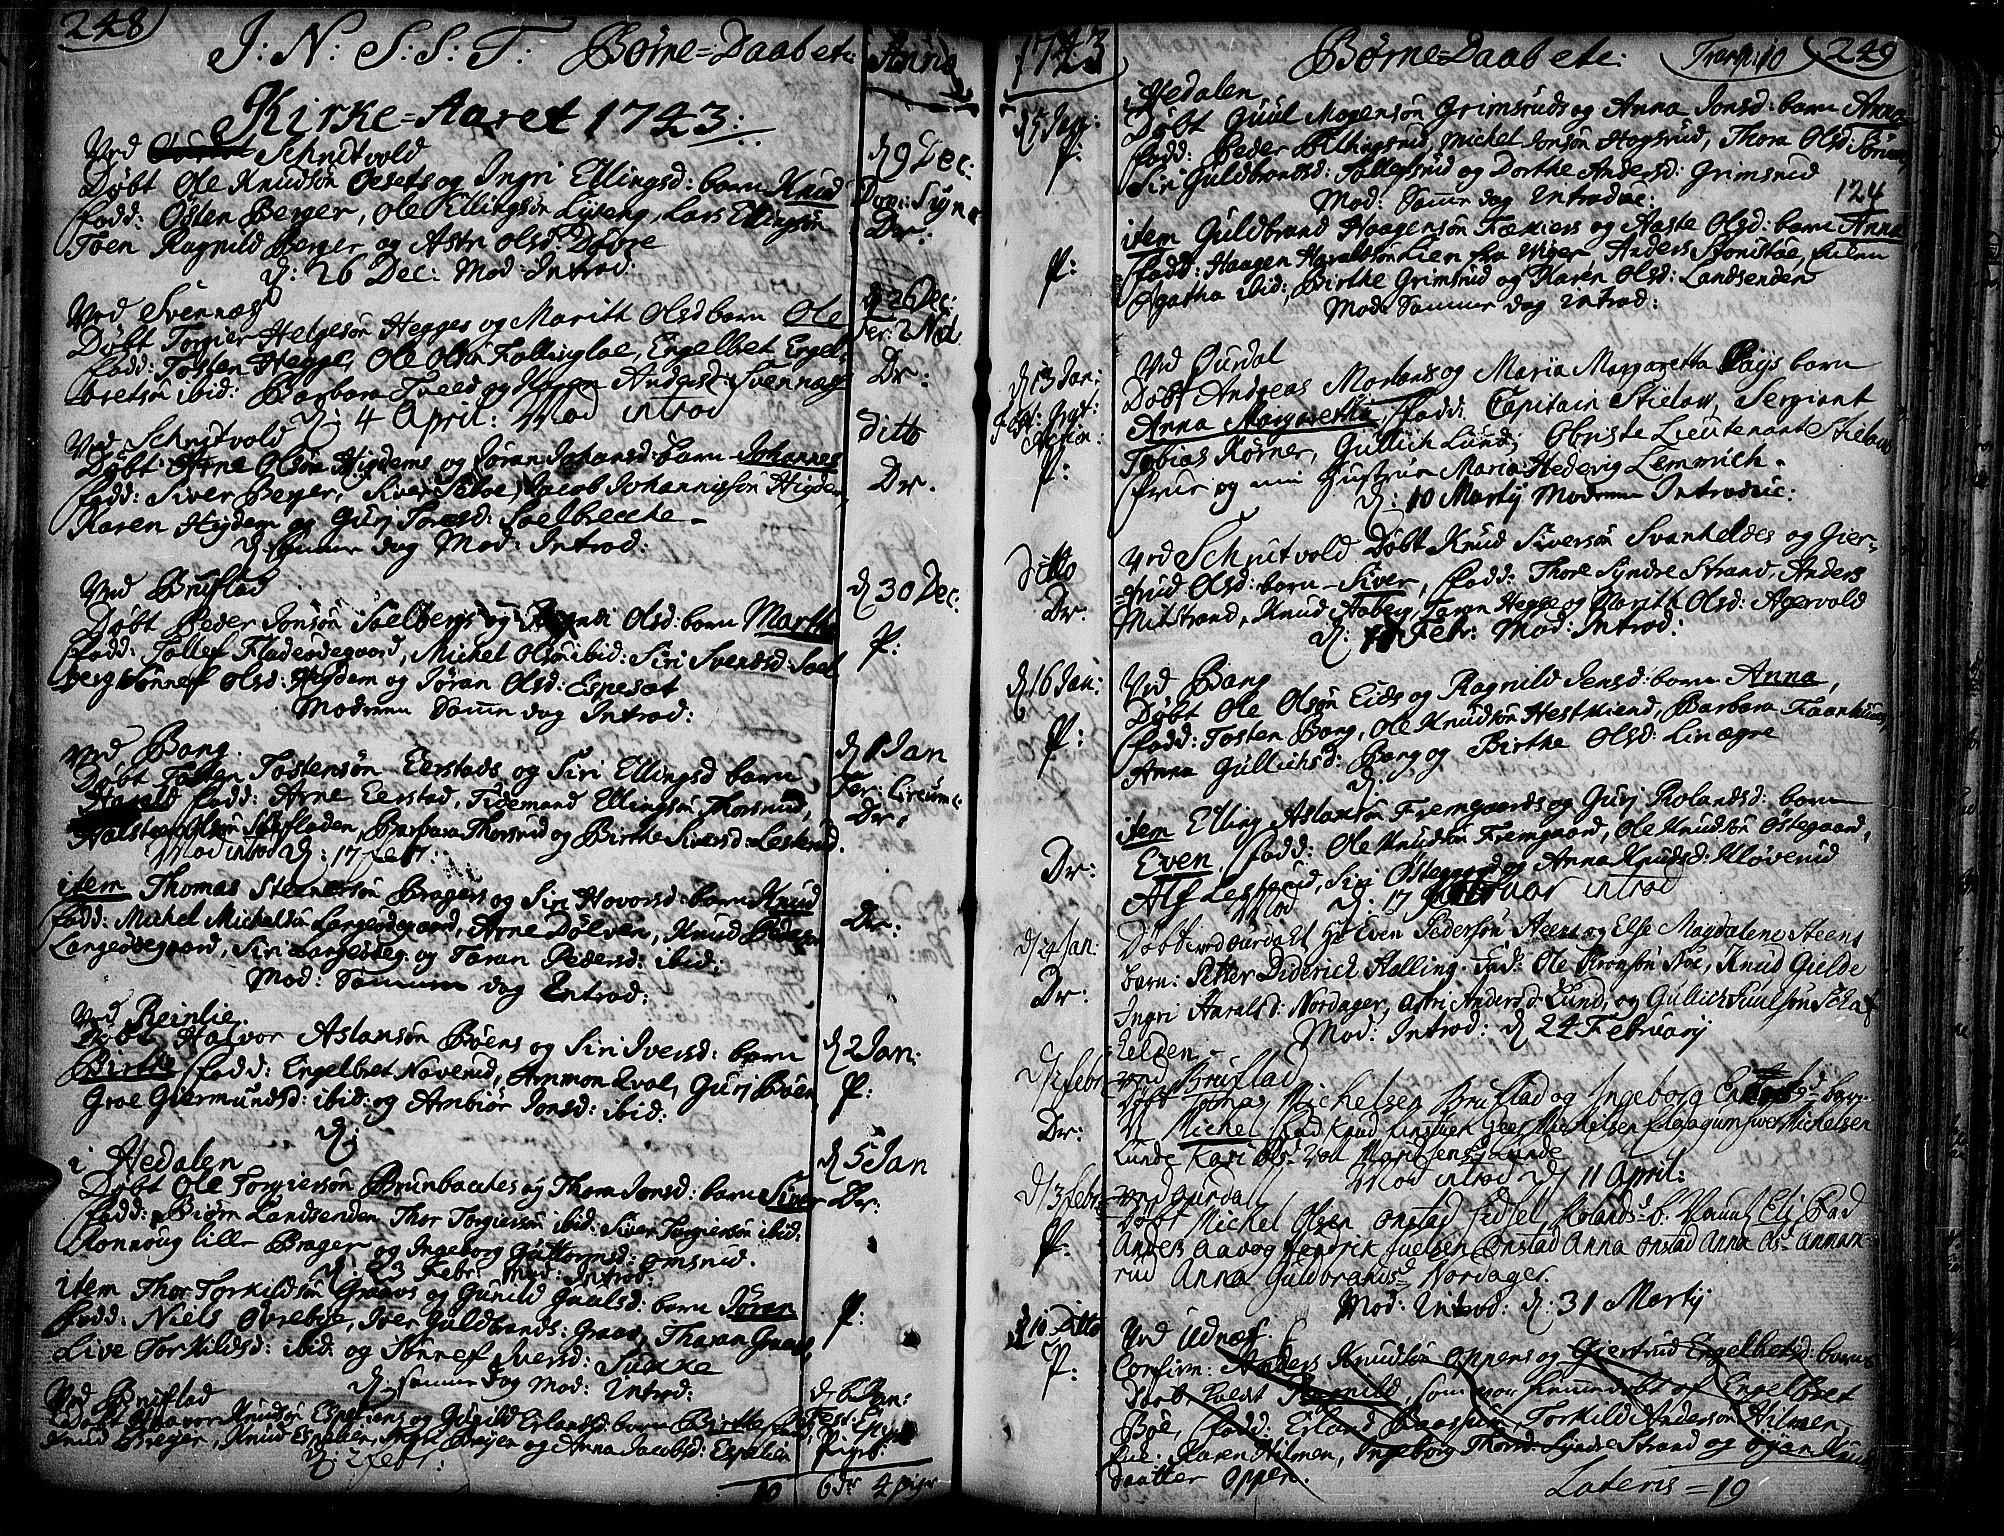 SAH, Aurdal prestekontor, Ministerialbok nr. 4, 1730-1762, s. 248-249